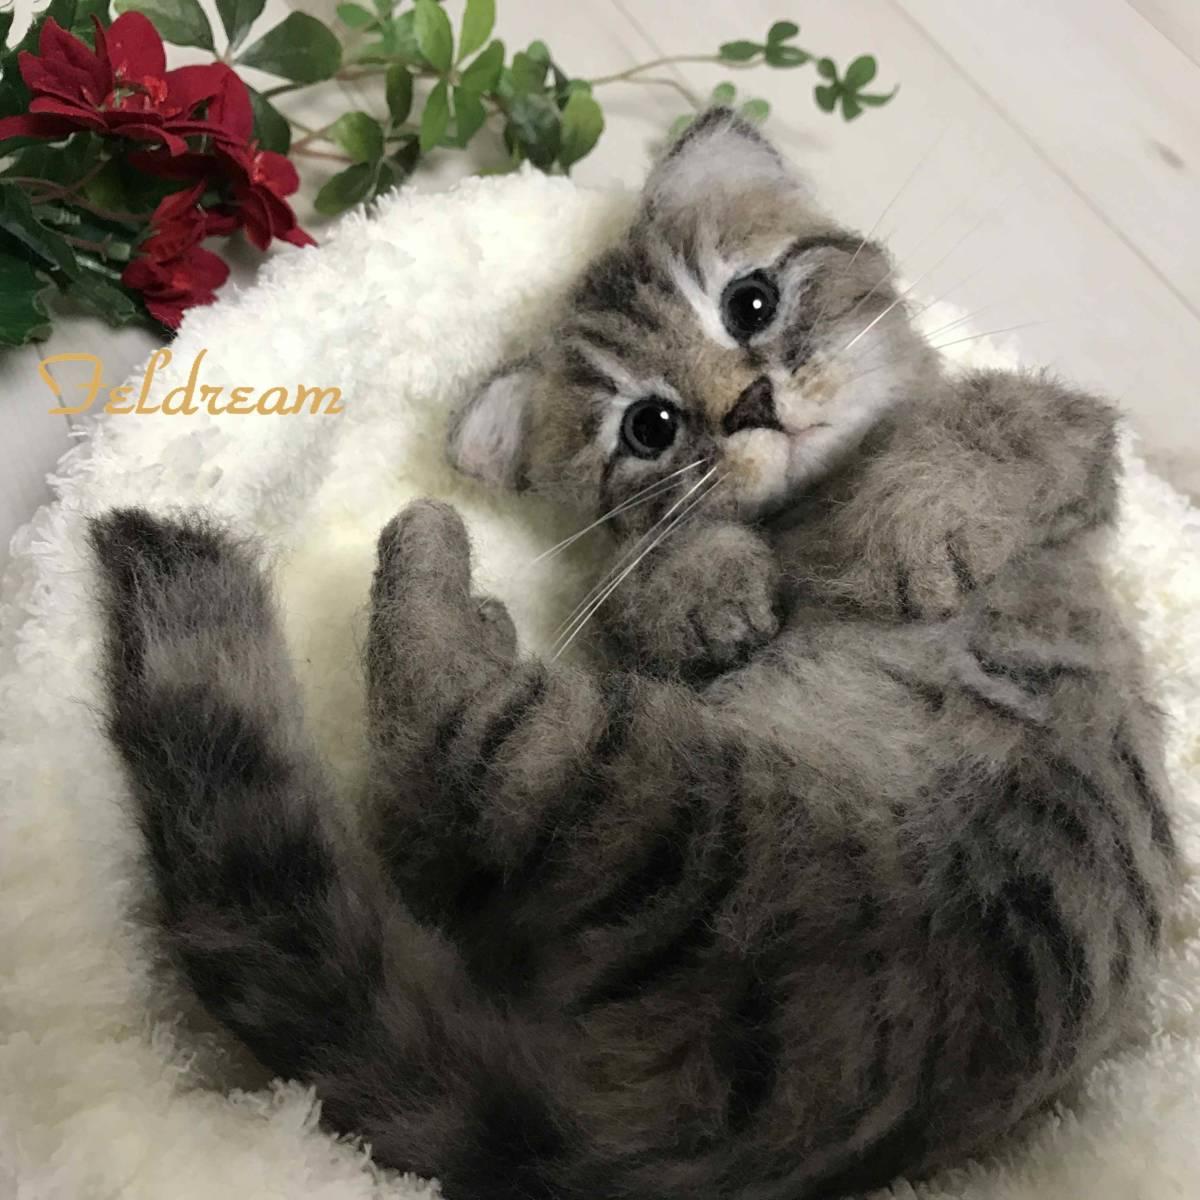 Feldream◆羊毛フェルト猫 ごろにゃん♪ キジトラ子猫 《実物大》 ハンドメイド_画像9